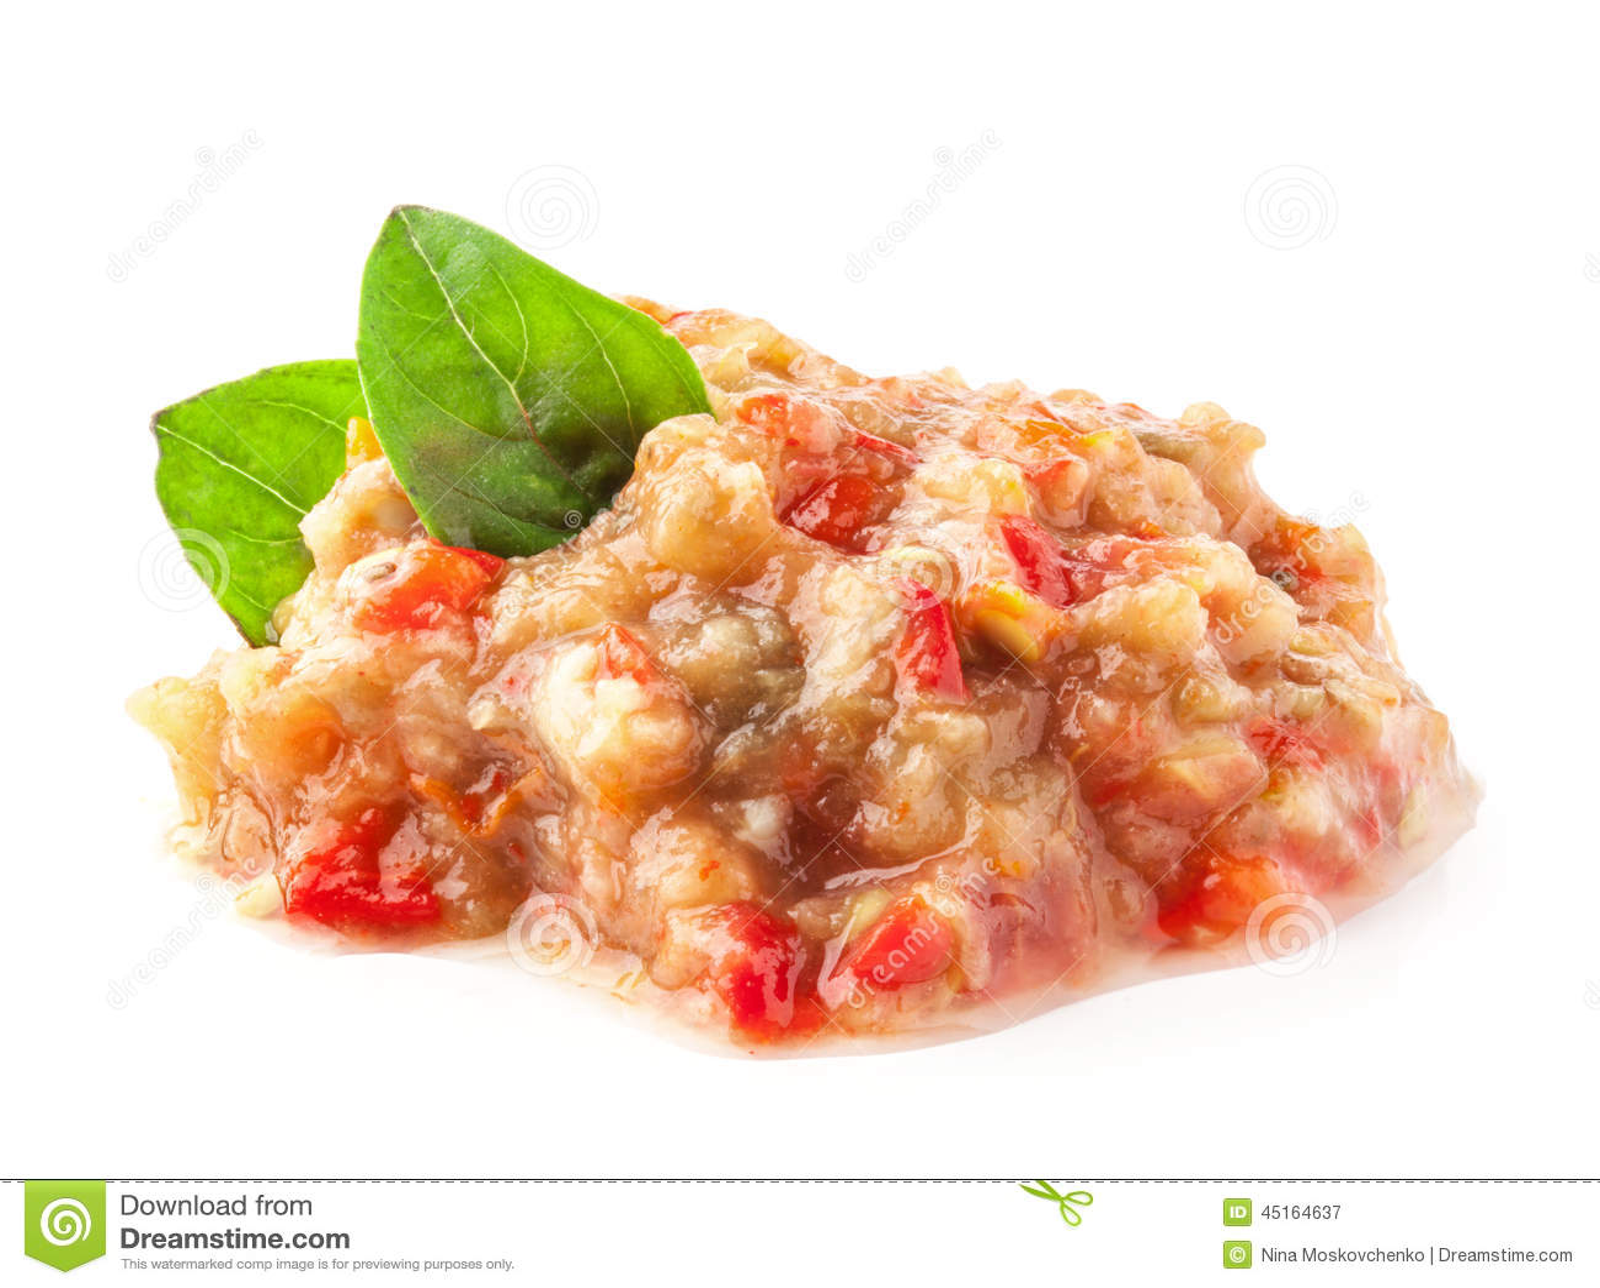 Pindjur - salada com beringela roasted, tomates e pimenta doce